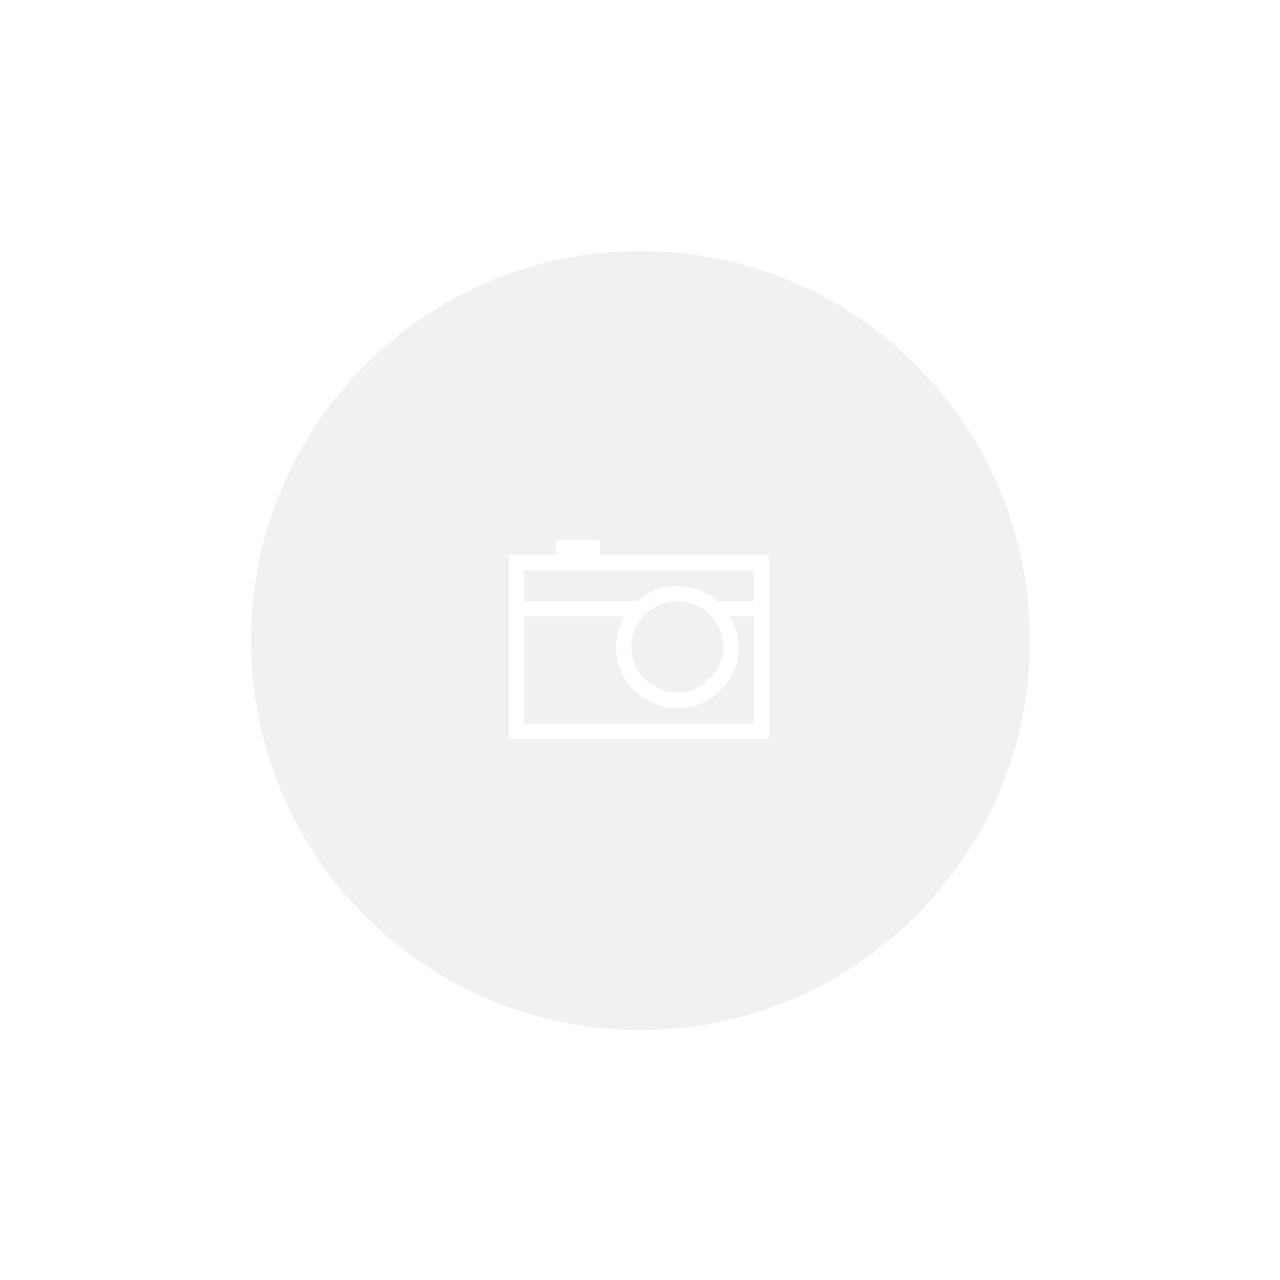 Papel Artesanal Indiano - Ref. 86